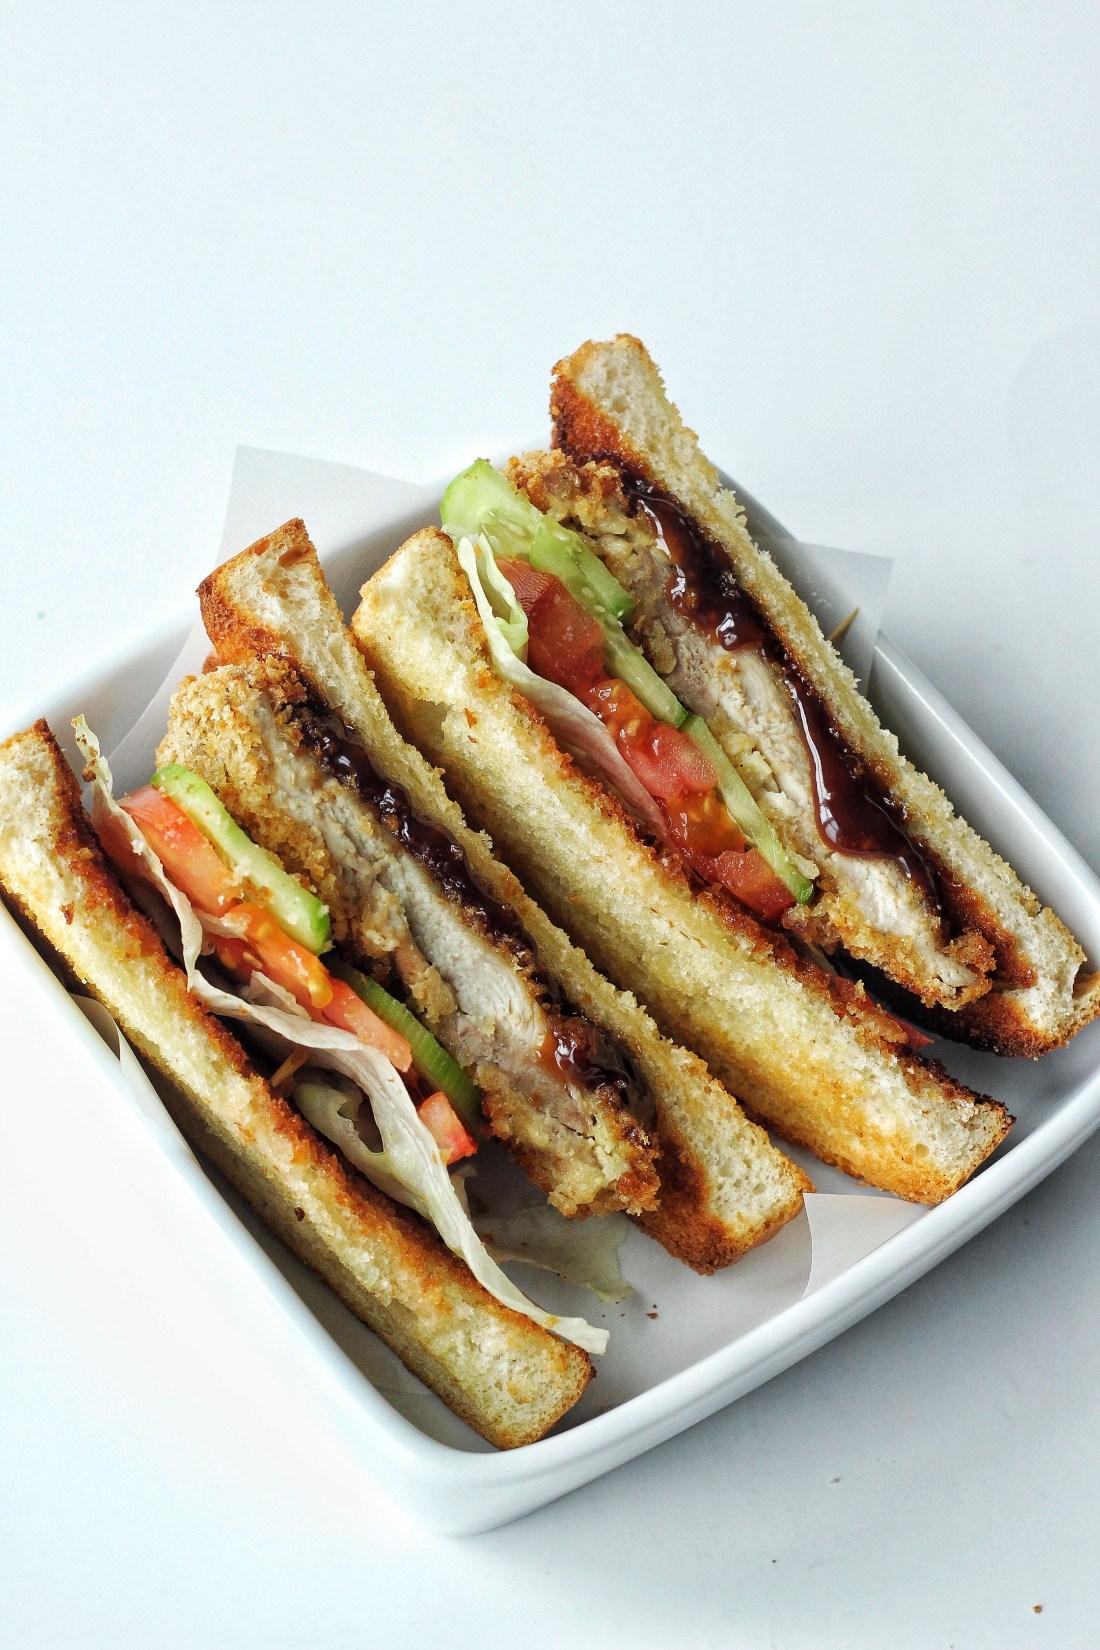 Baked Crispy Chicken Sandwich with Teriyaki Sauce